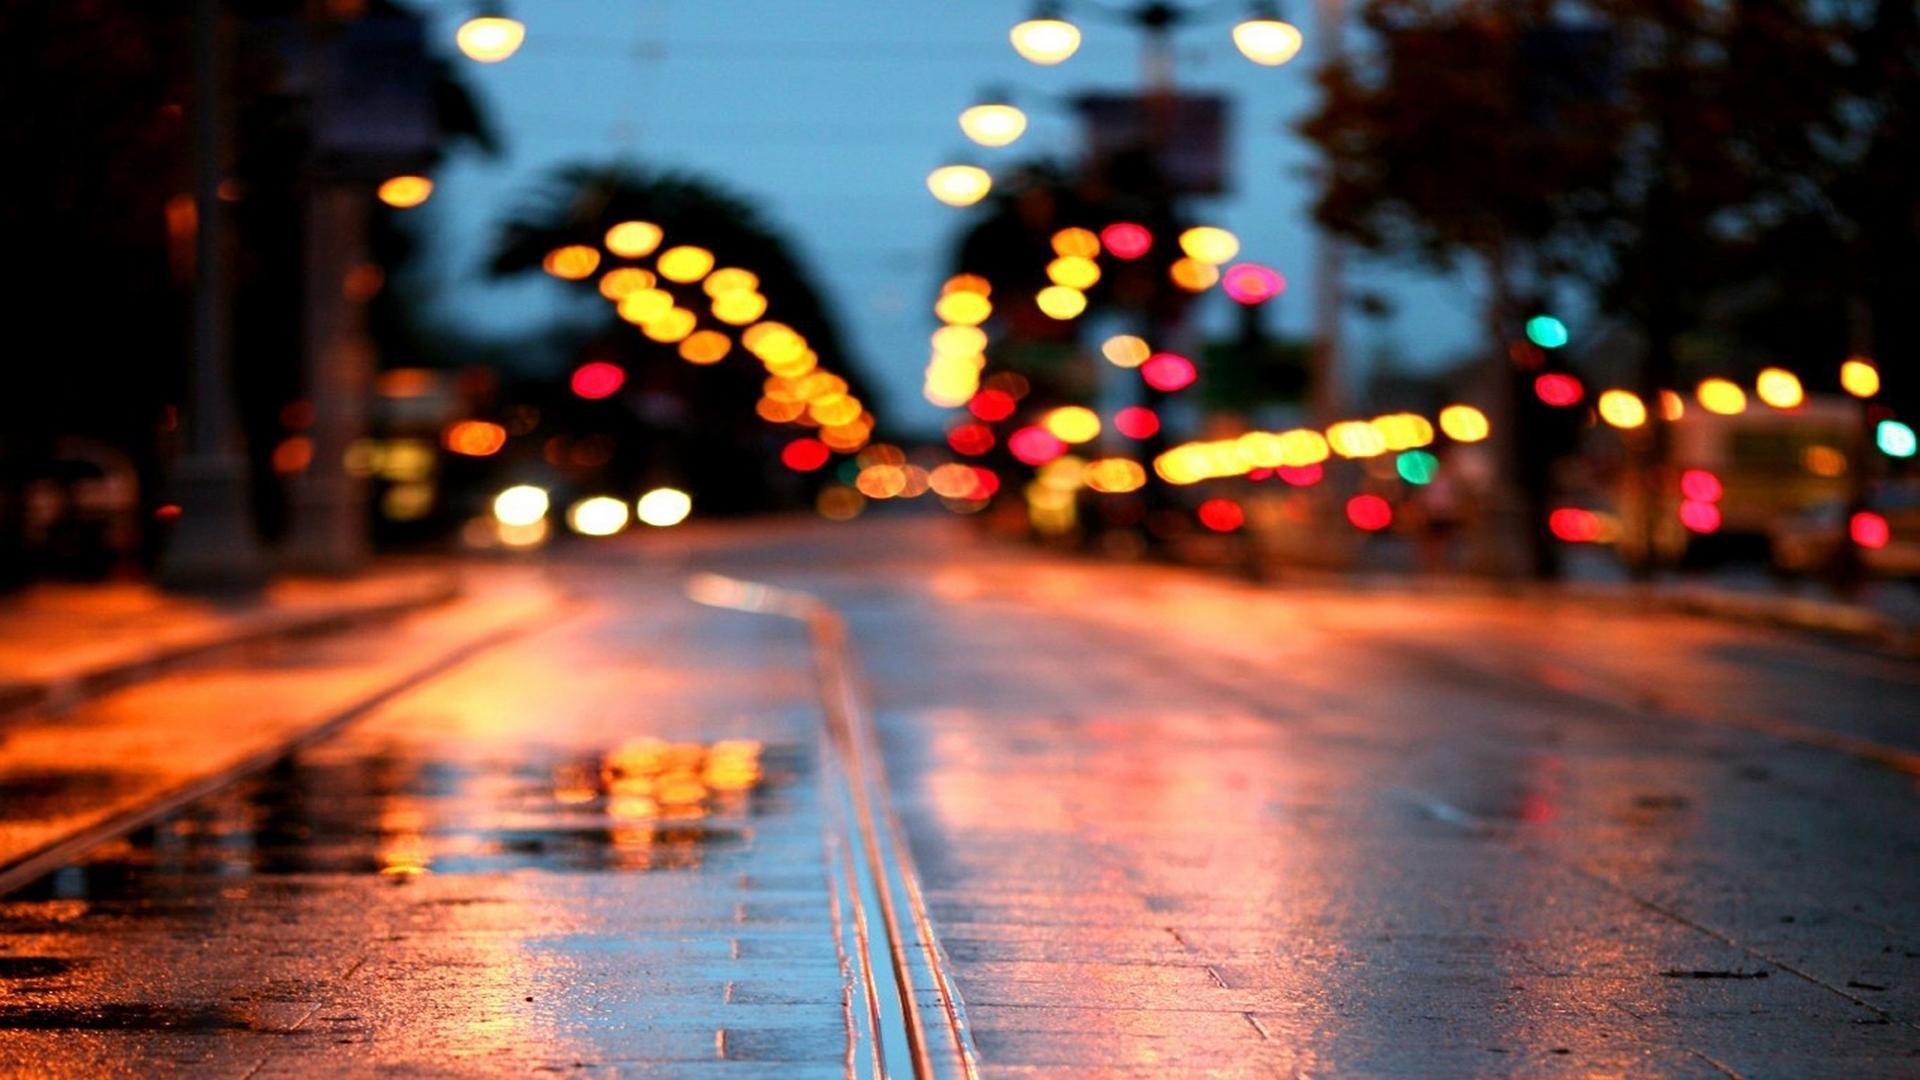 Франция дороги ночь фонари  № 2229309 бесплатно